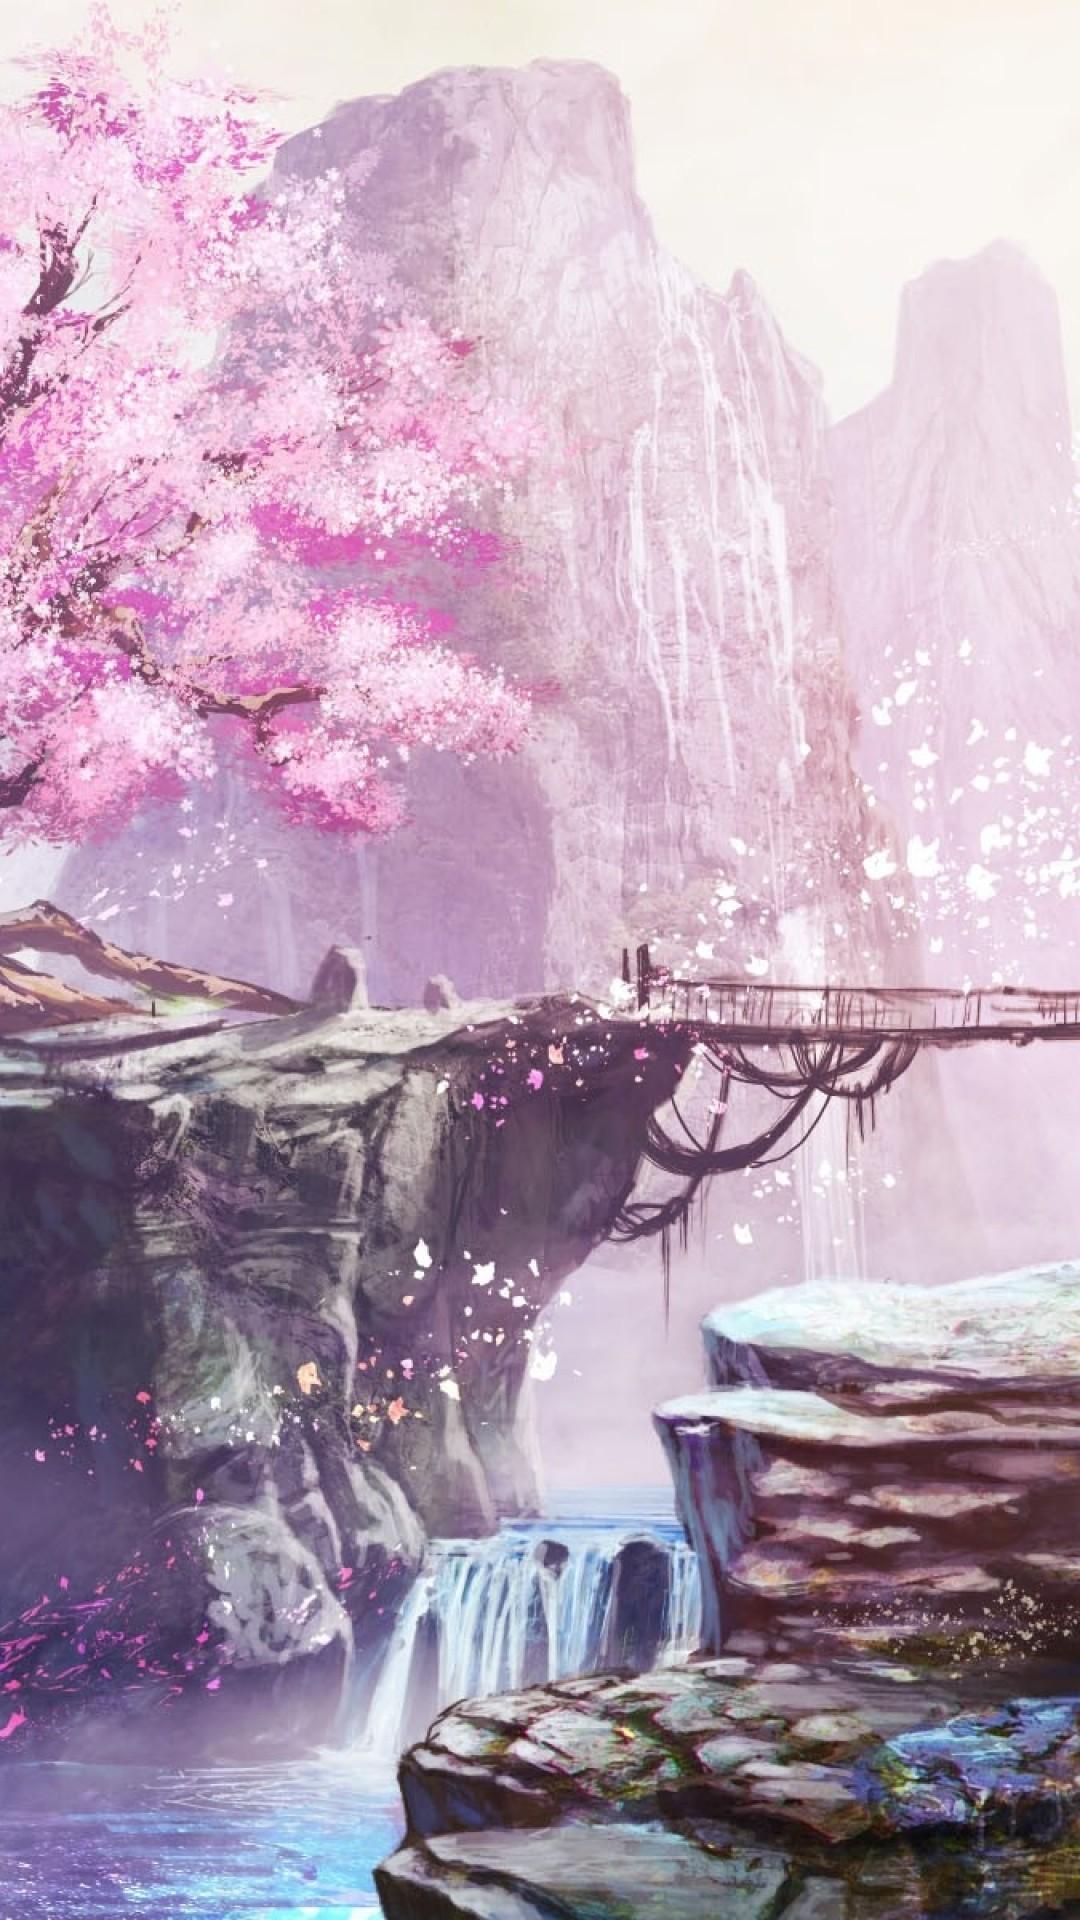 Anime Landscape, Cherry Blossom, Bridge, Waterfall, - Cherry Blossom Iphone Wallpaper Anime - HD Wallpaper